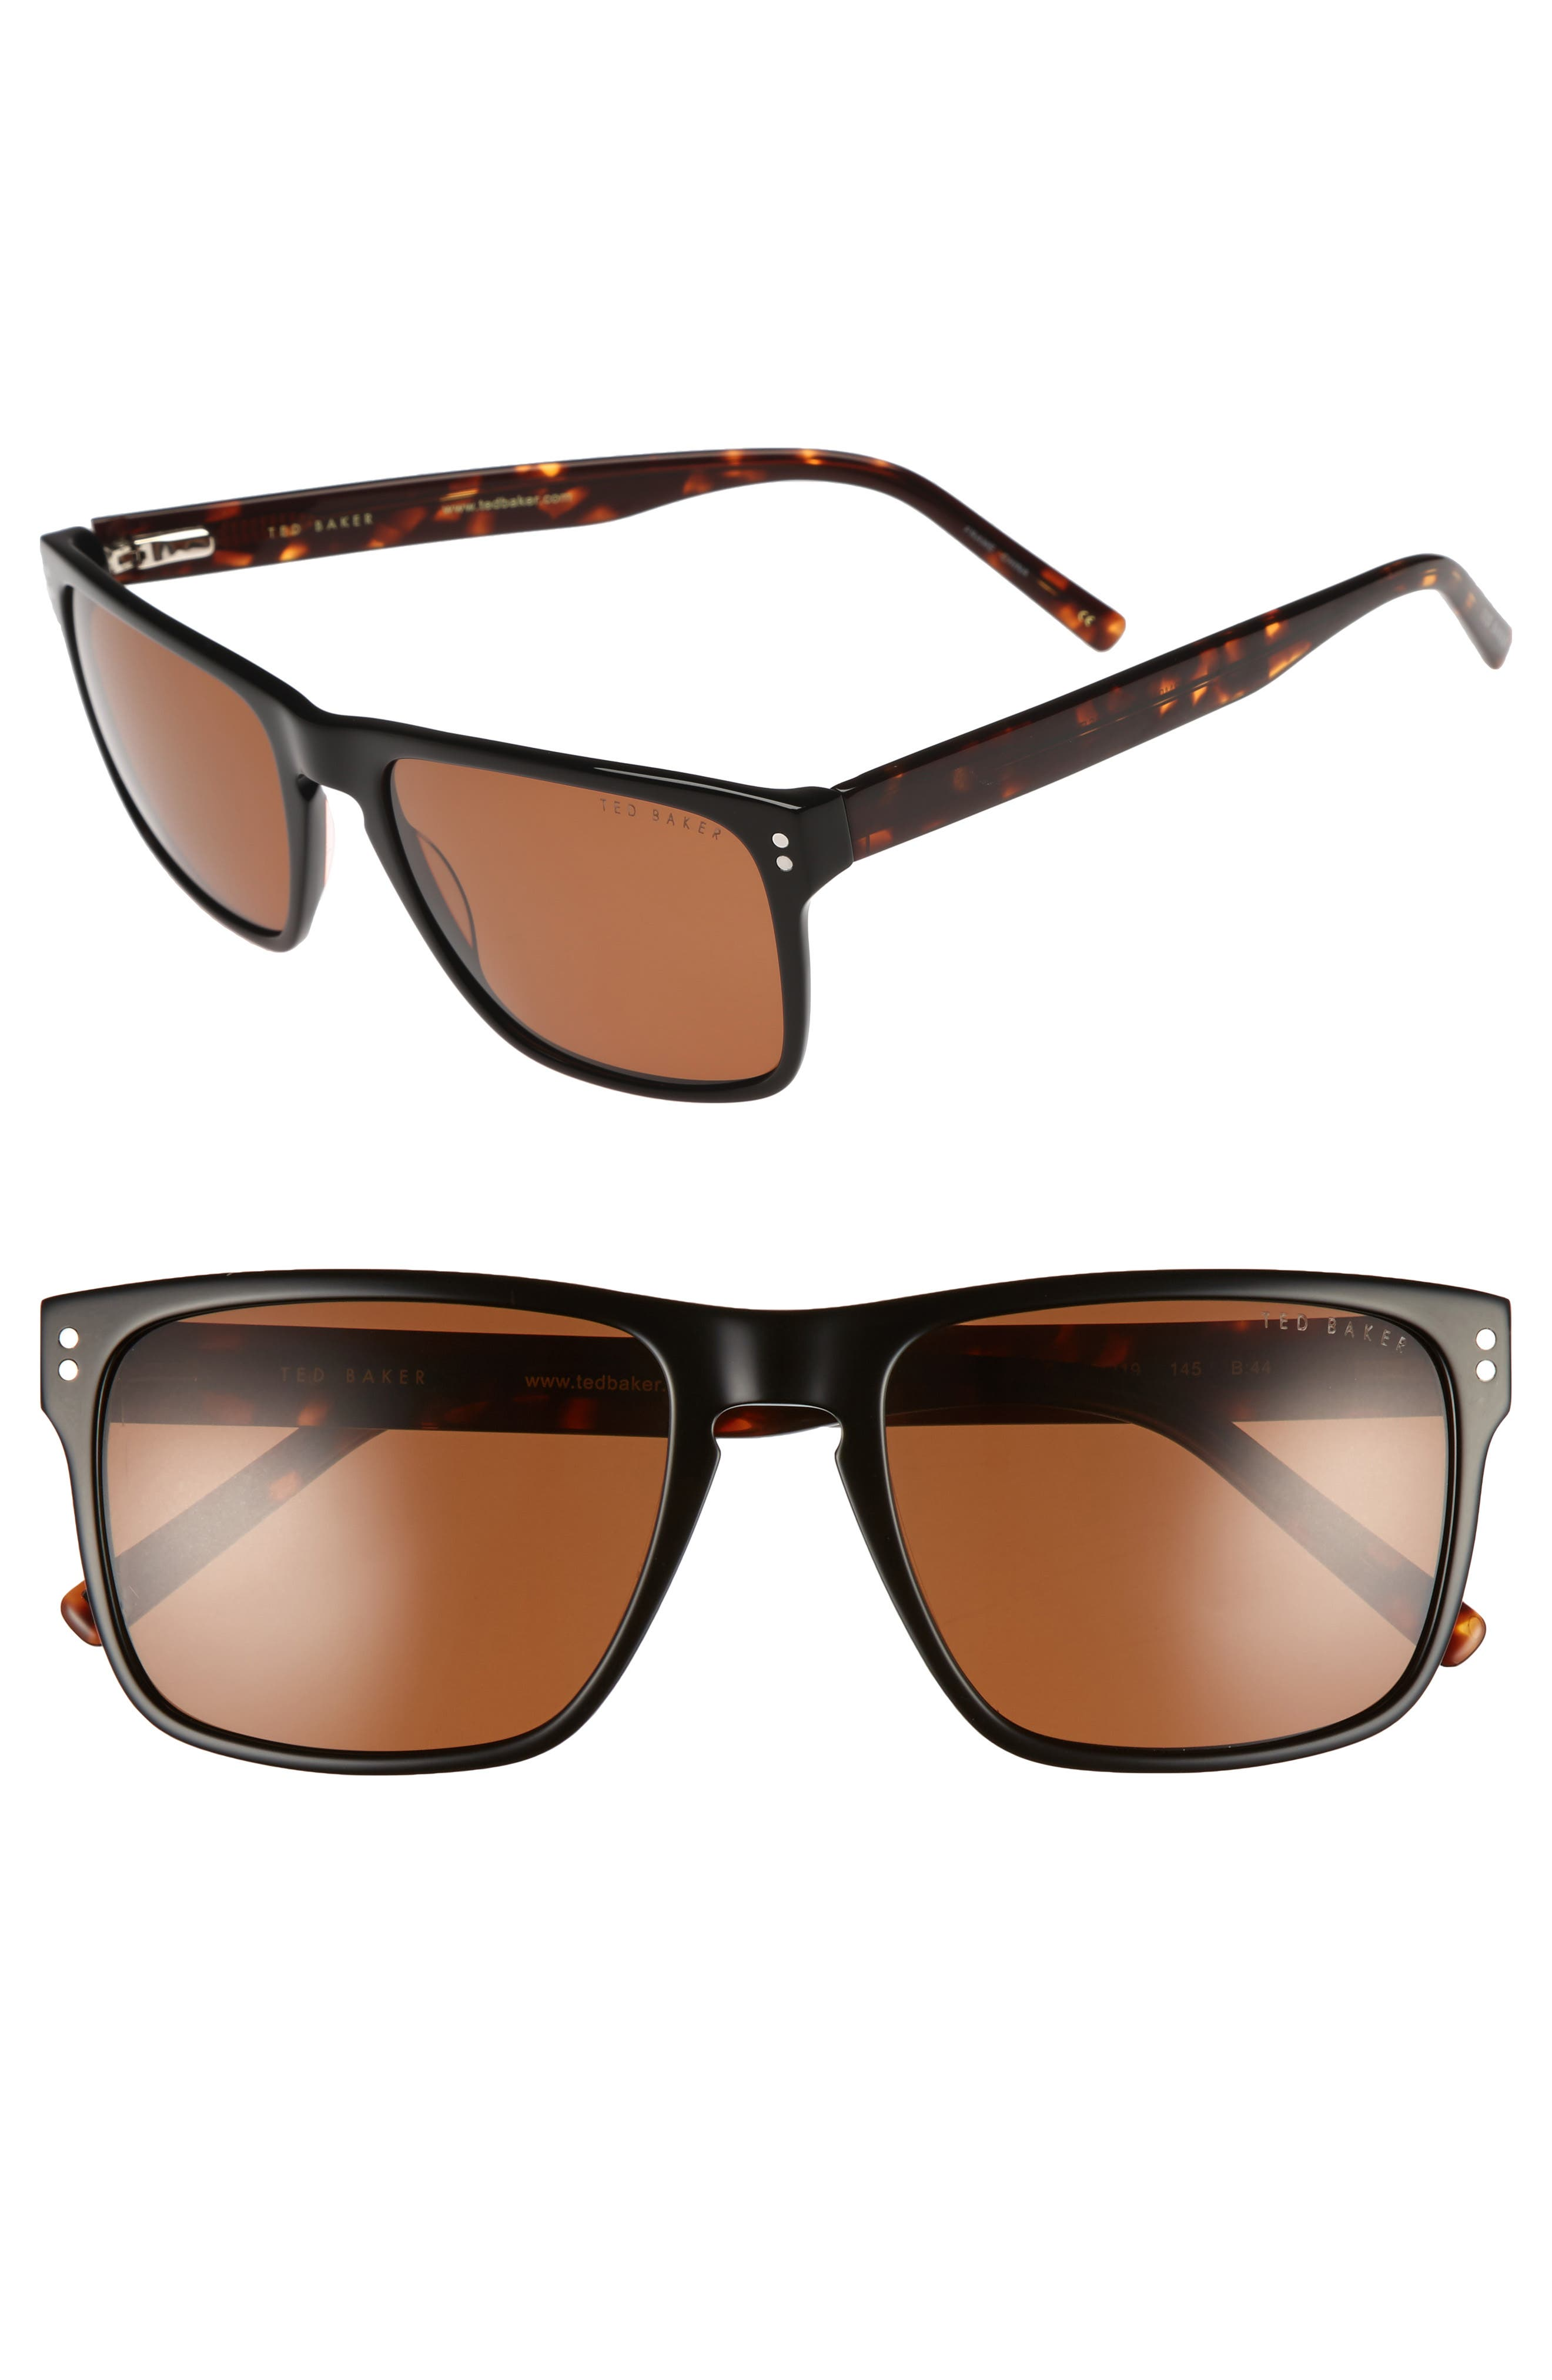 Main Image - Ted Baker London 56mm Polarized Rectangle Sunglasses